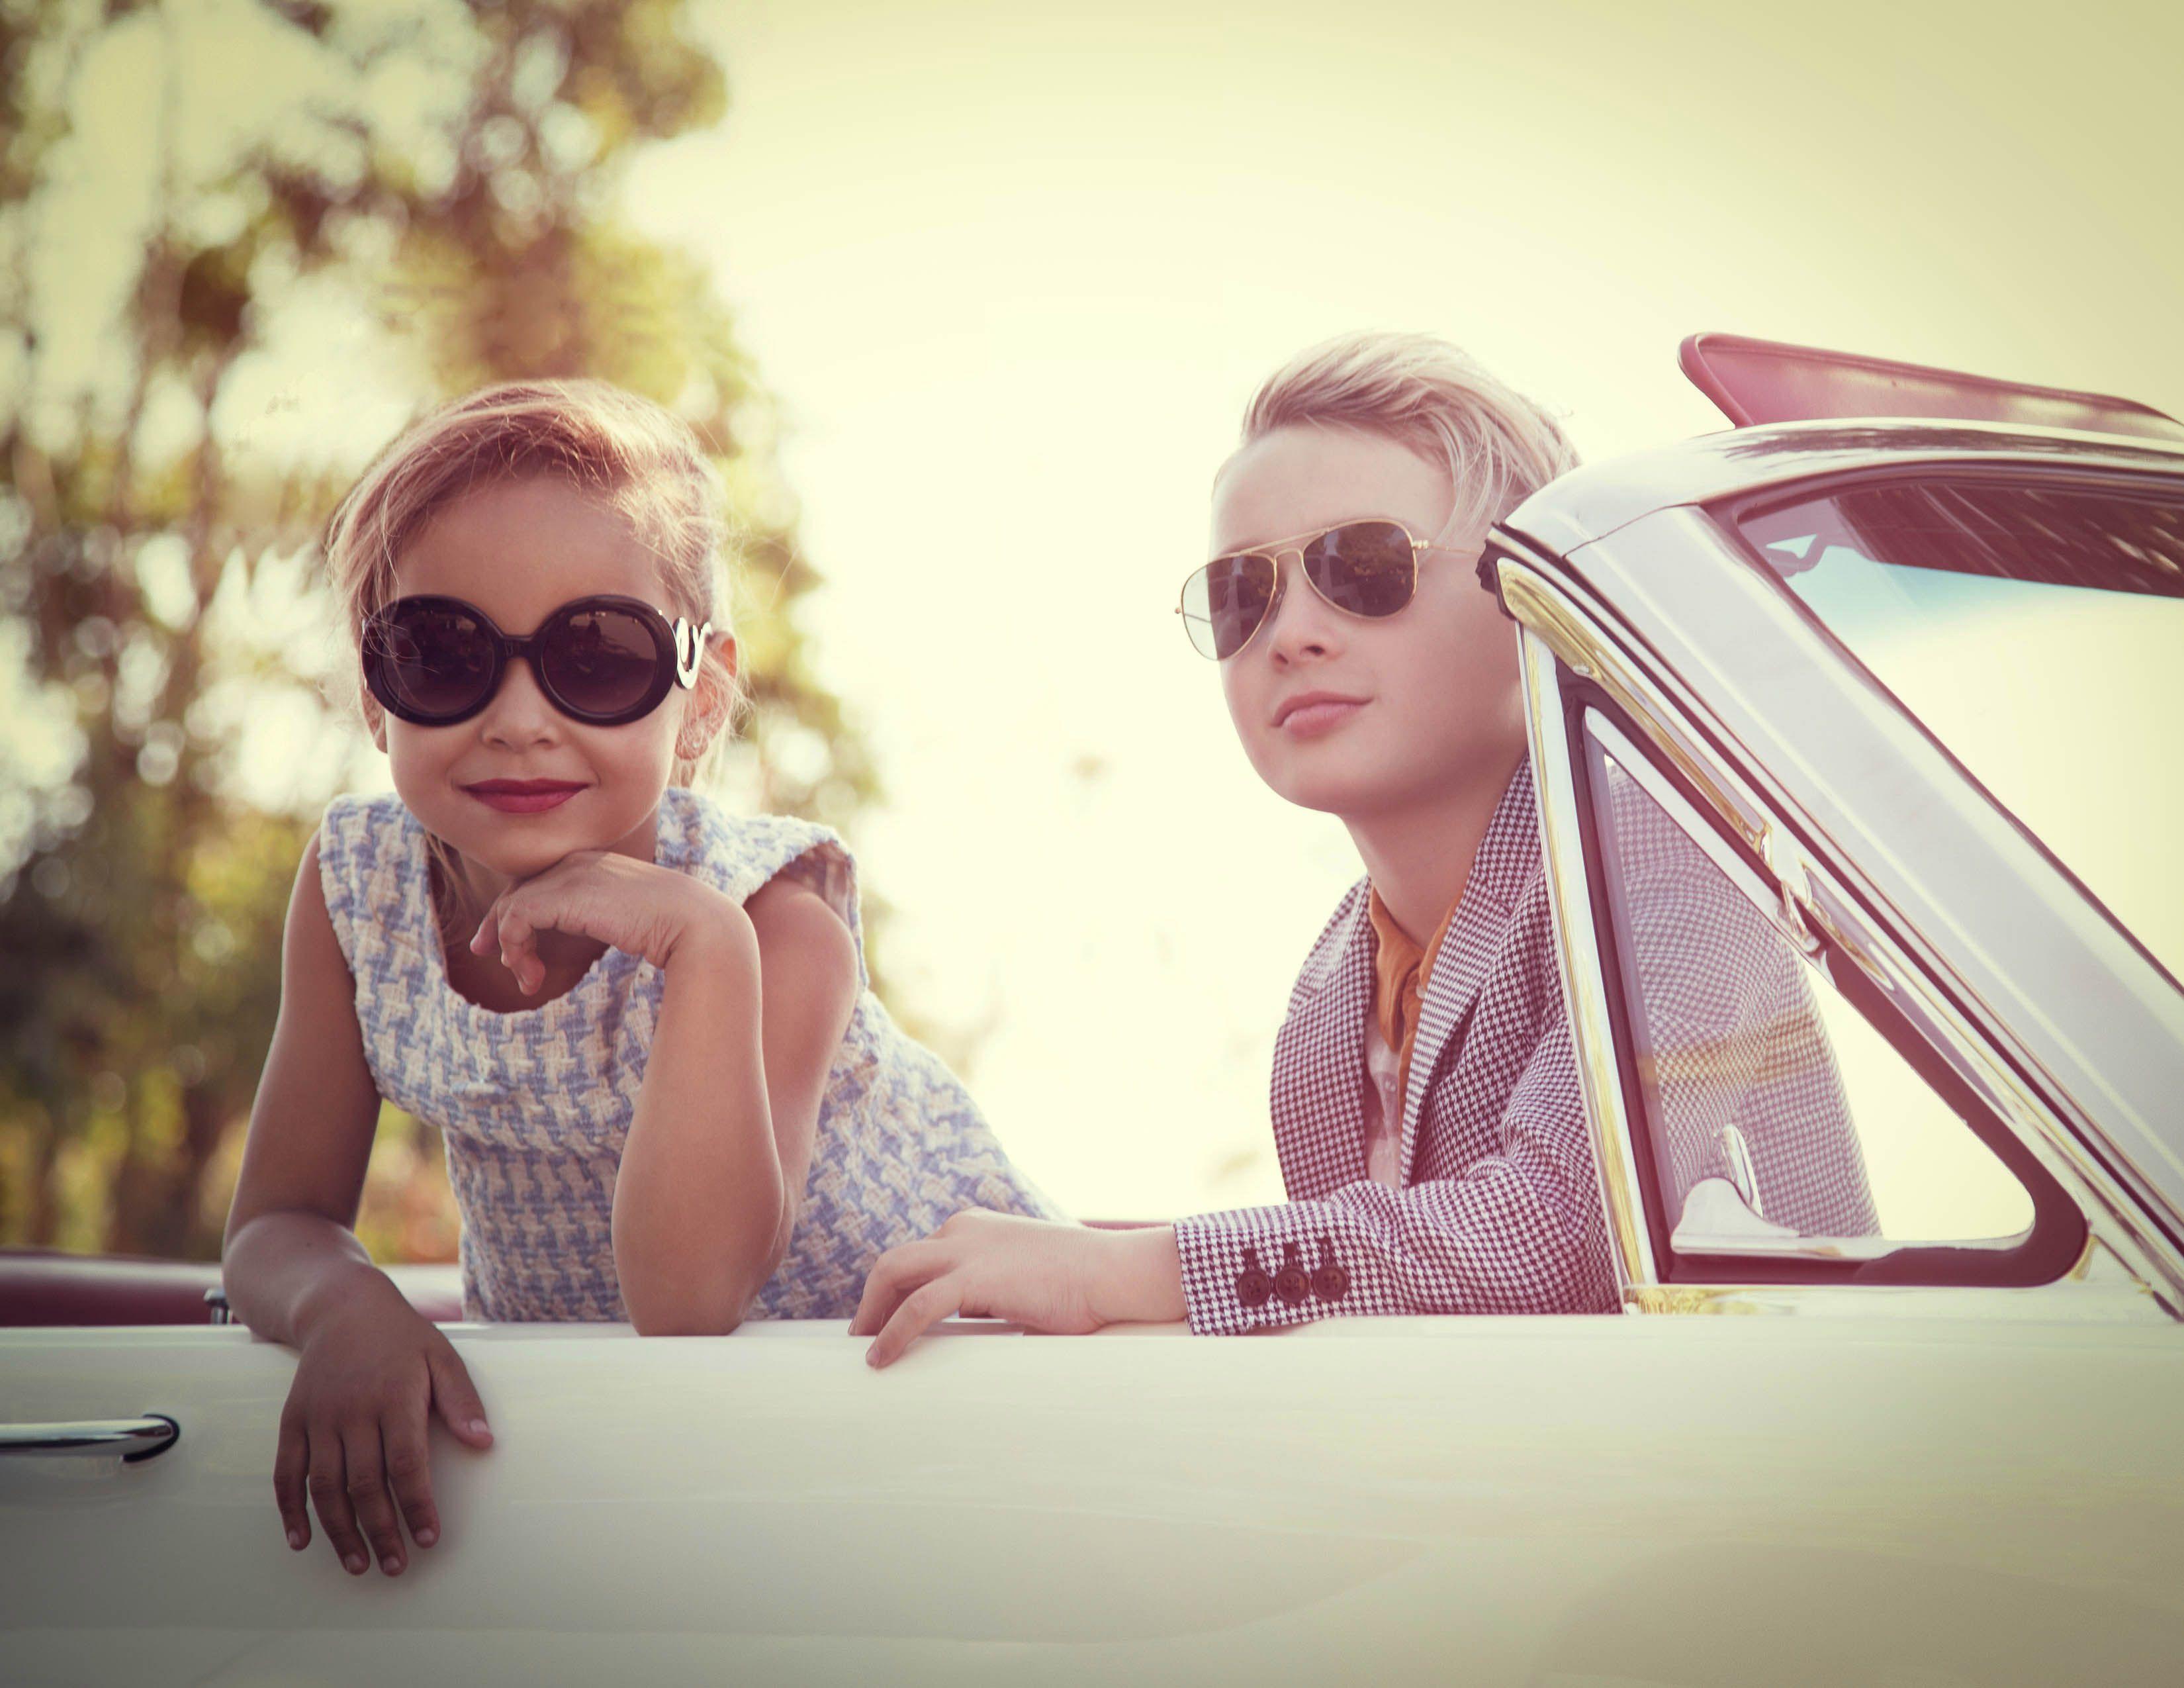 fashionkids, girlsfashion, harpertillman, wynngoldberg